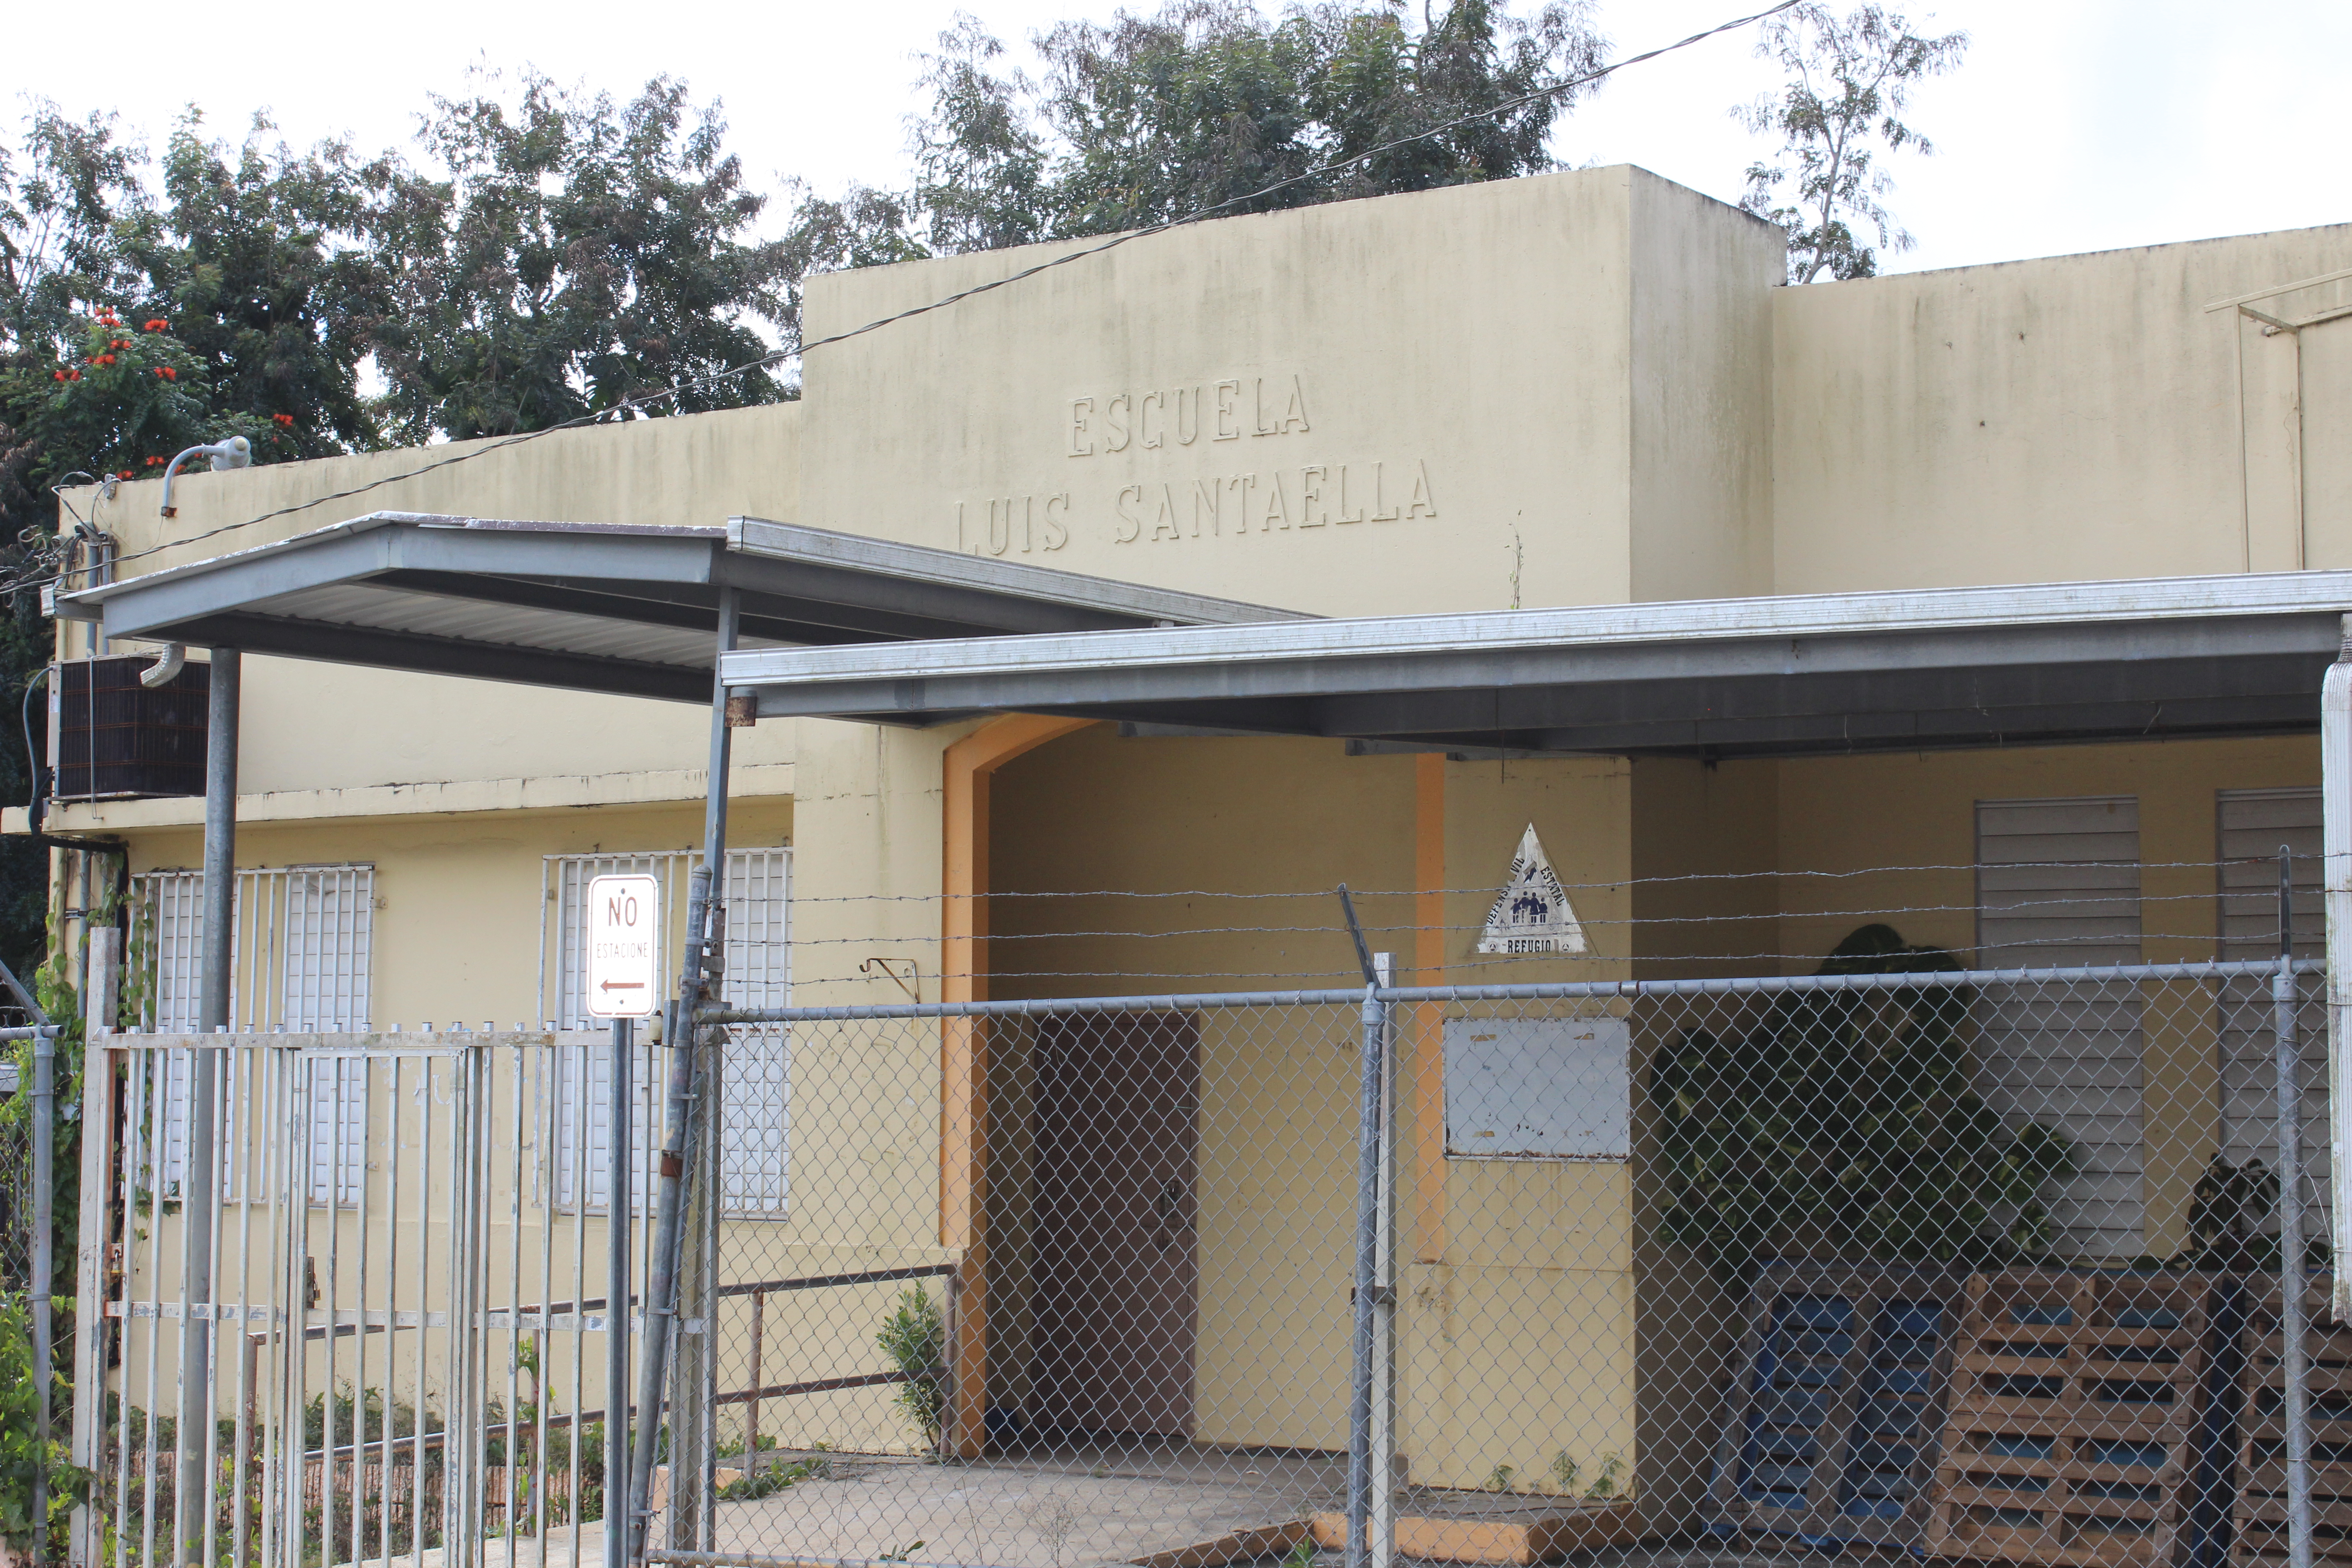 Picture shows Escuela Luis Santaella, a shut down school outside of San Juan, Puerto Rico